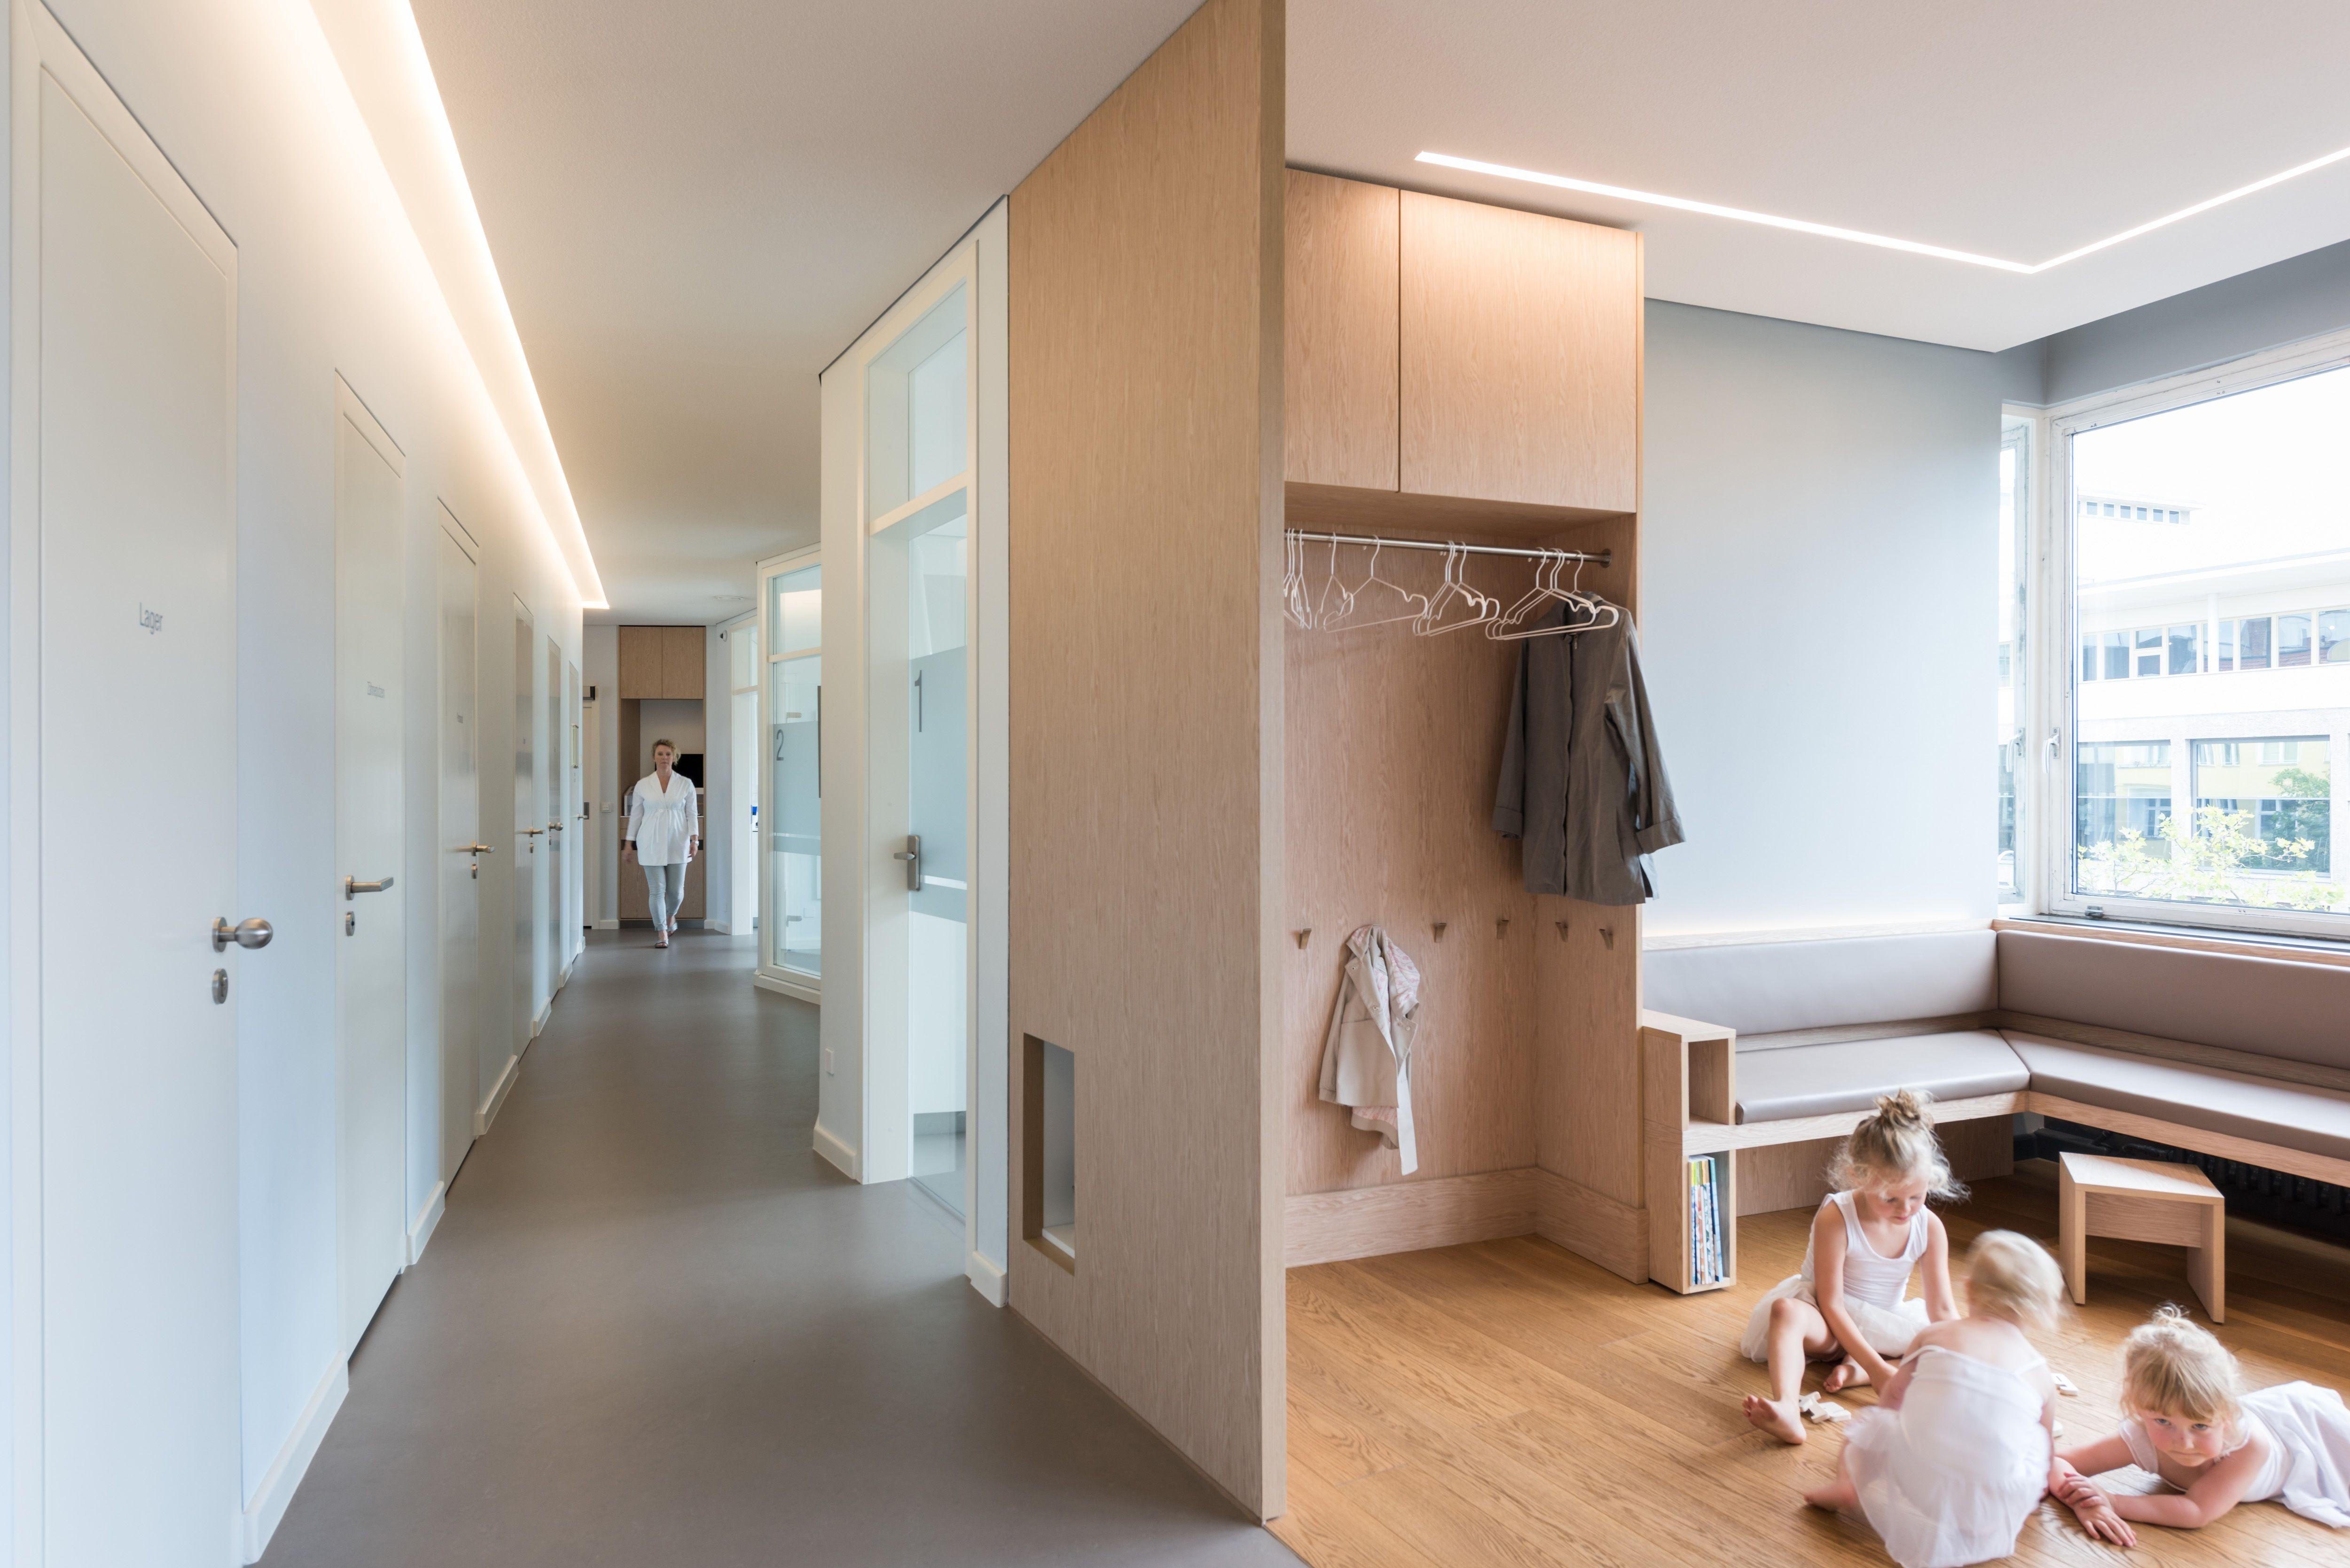 Zahnarztpraxis Berlin by fl!nk.architekten | zahnarztpraxis